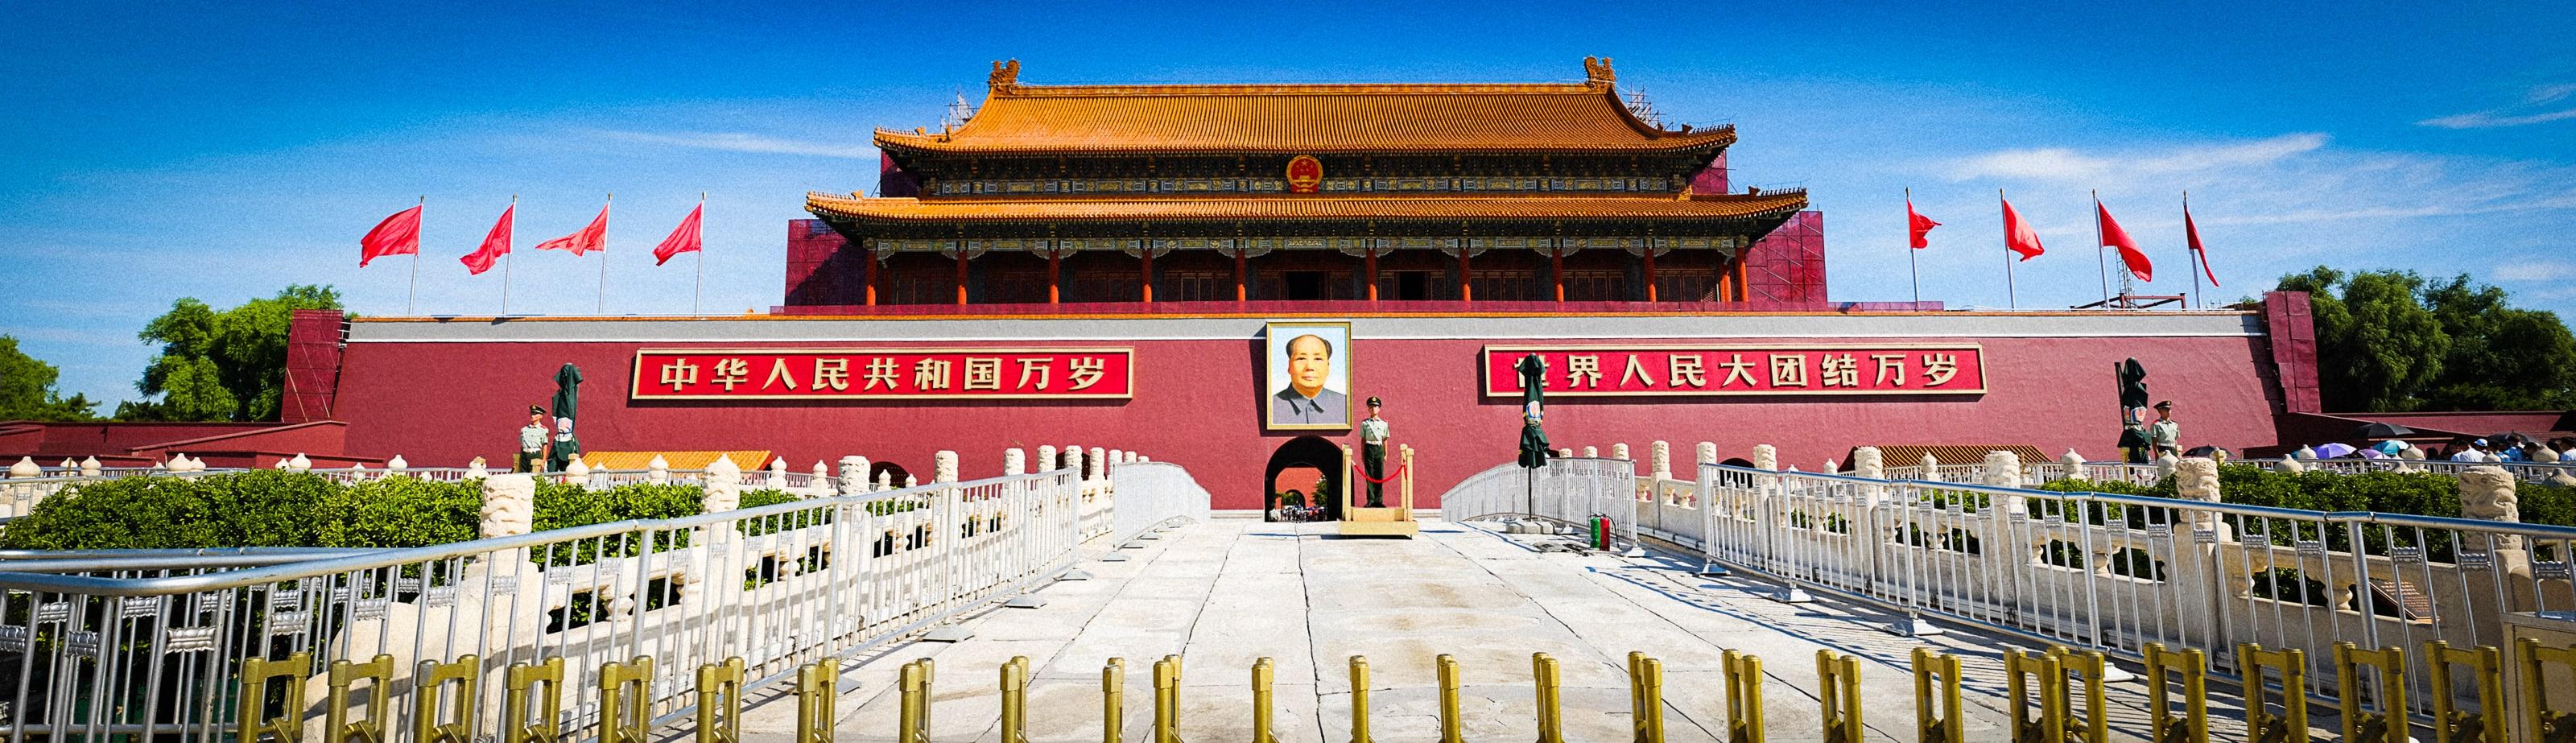 """Gate"" Beijing, 2018"